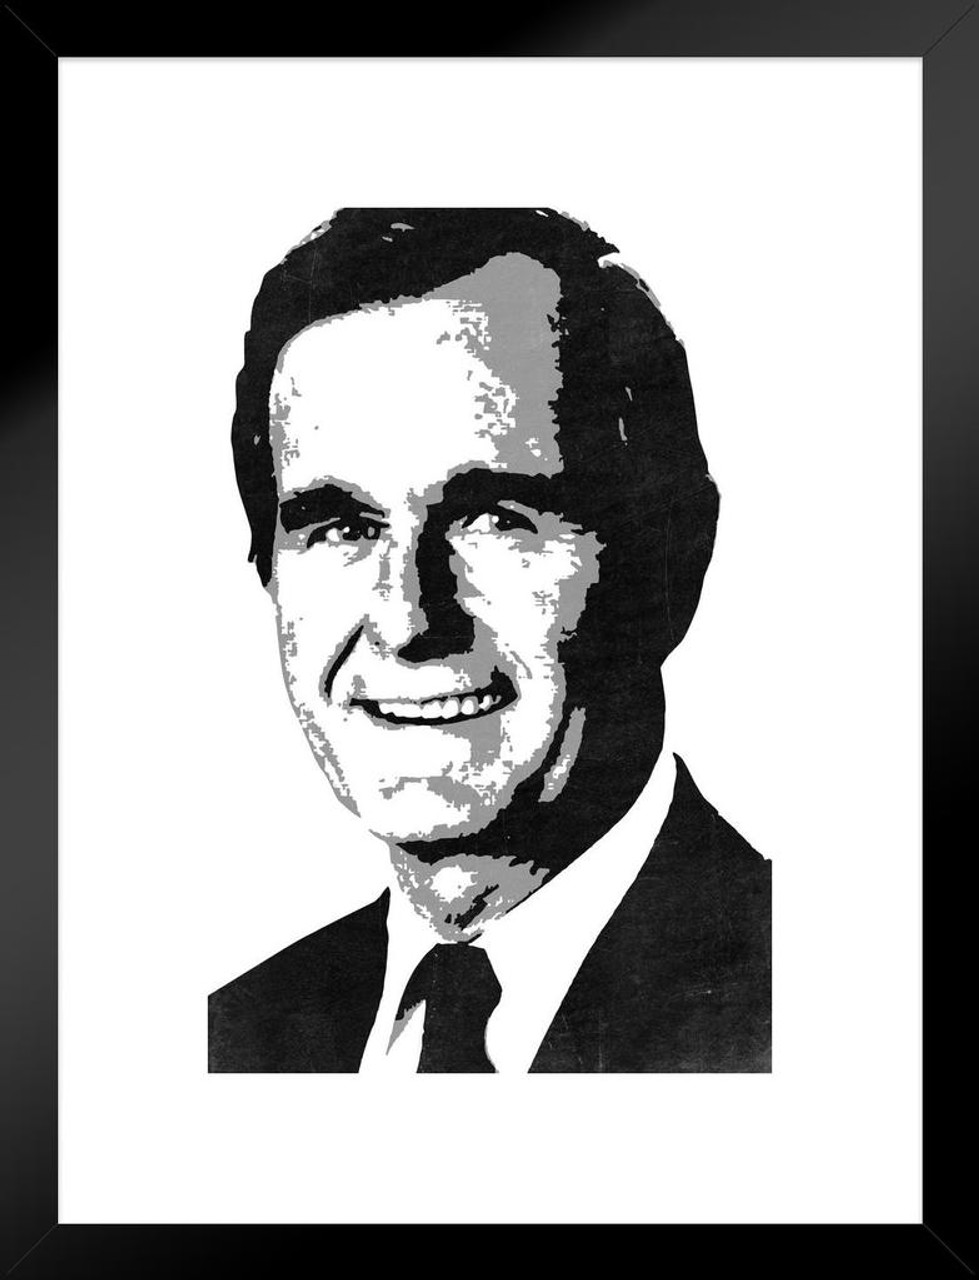 President george hw bush 41 pop art portrait republican politics politician white matted framed wall art